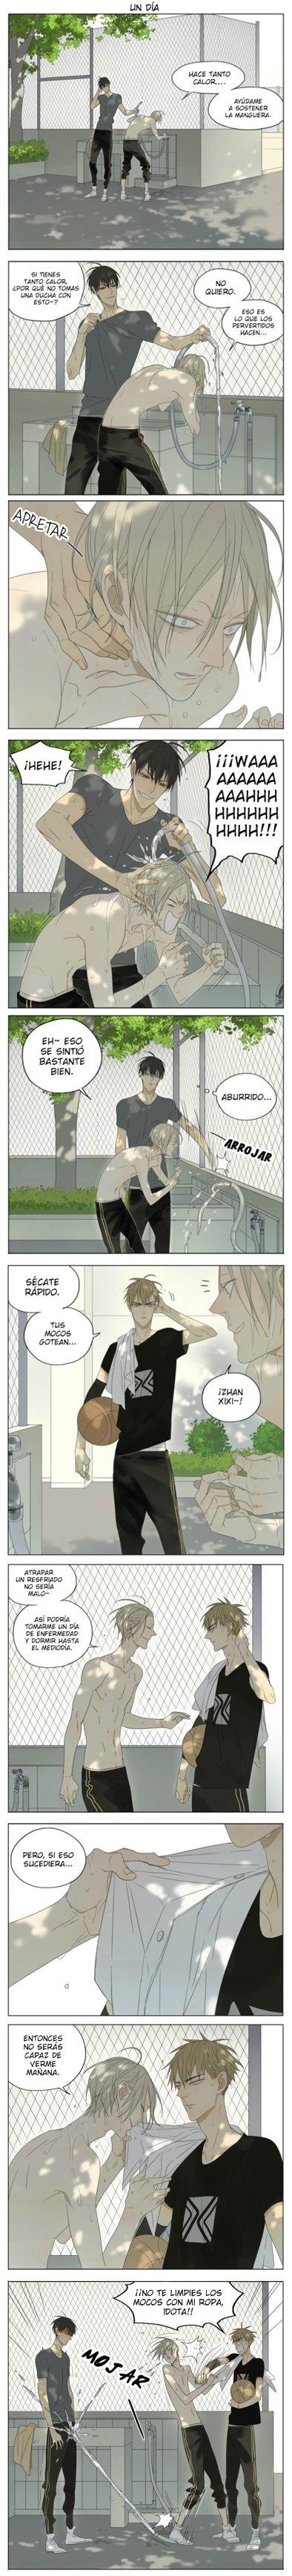 19 Days Capítulo 8 página 1 (Cargar imágenes: 6) - Leer Manga en Español gratis en NineManga.com